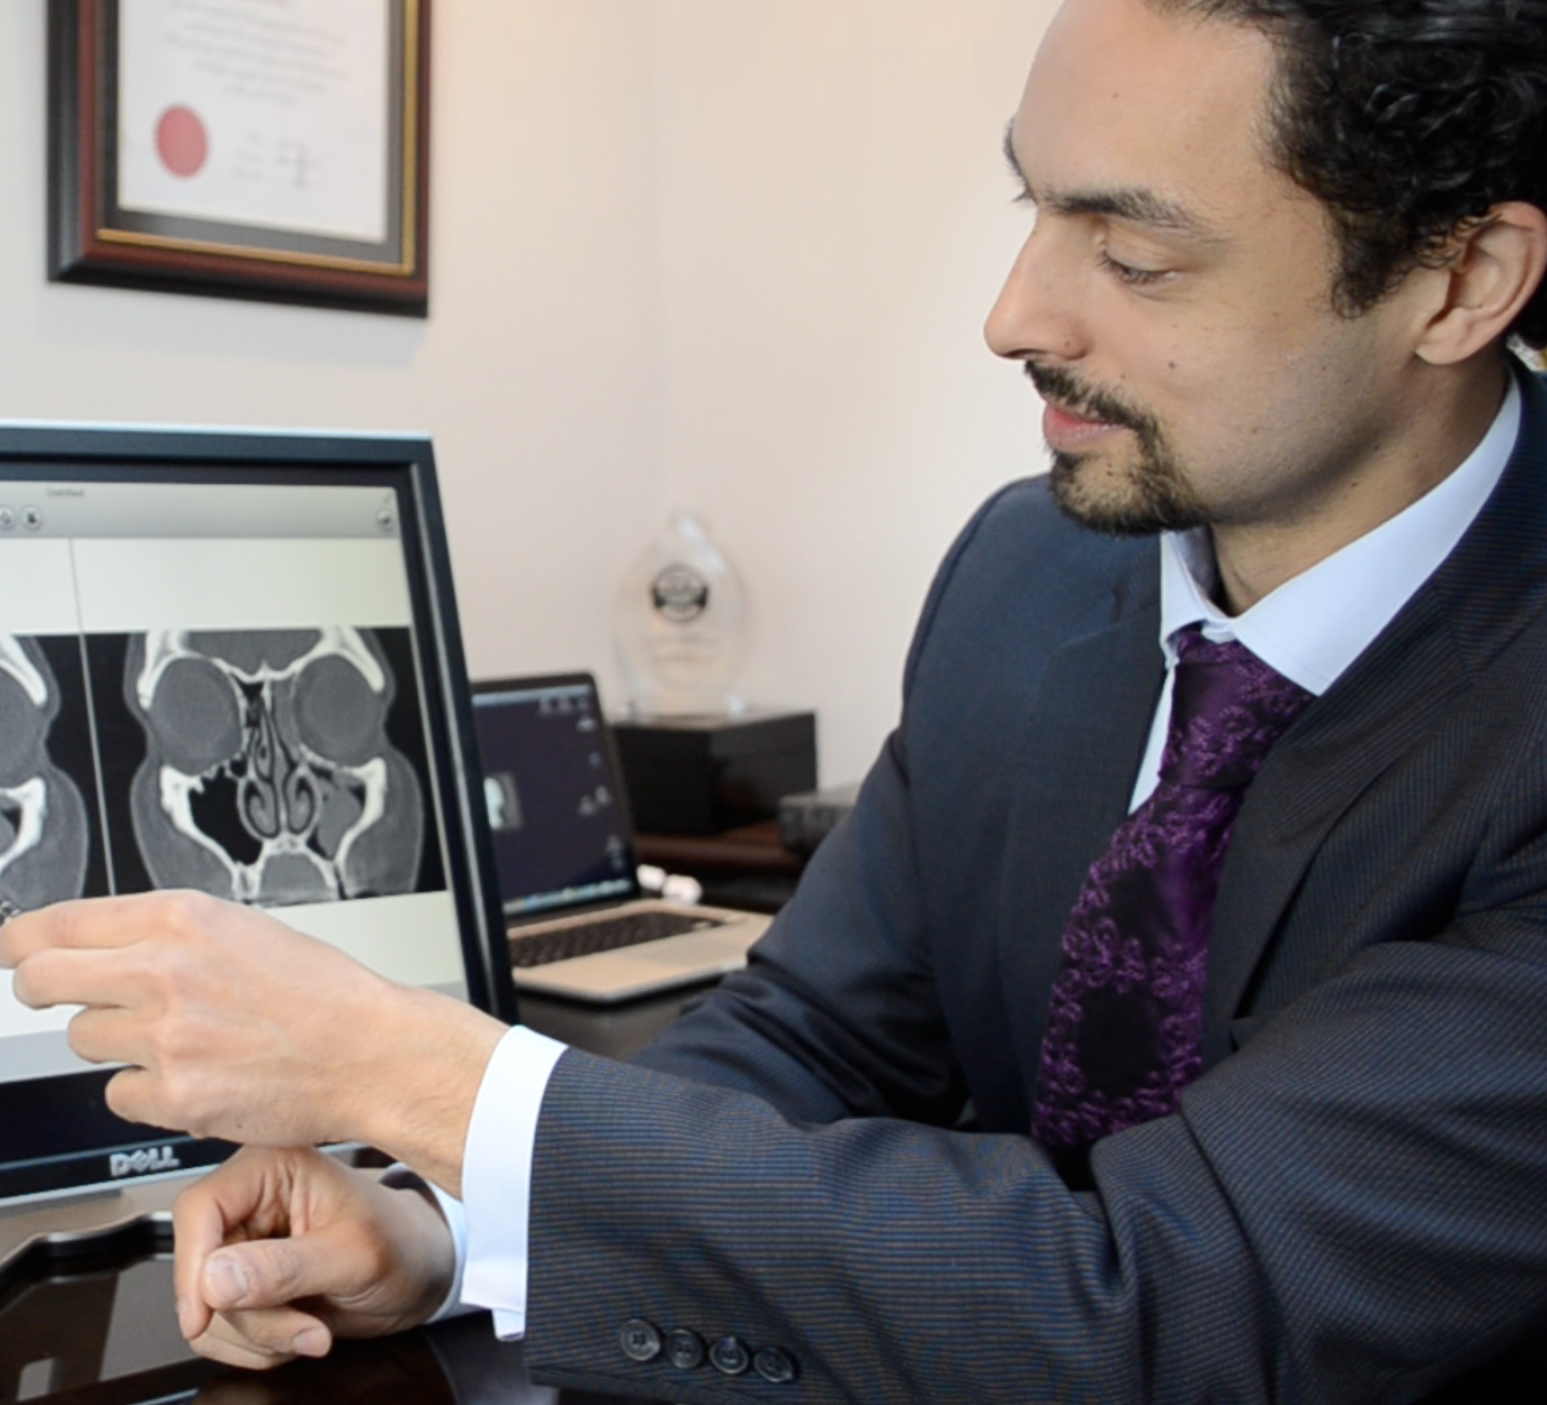 Dr. De Silva and PHILANTHROPY